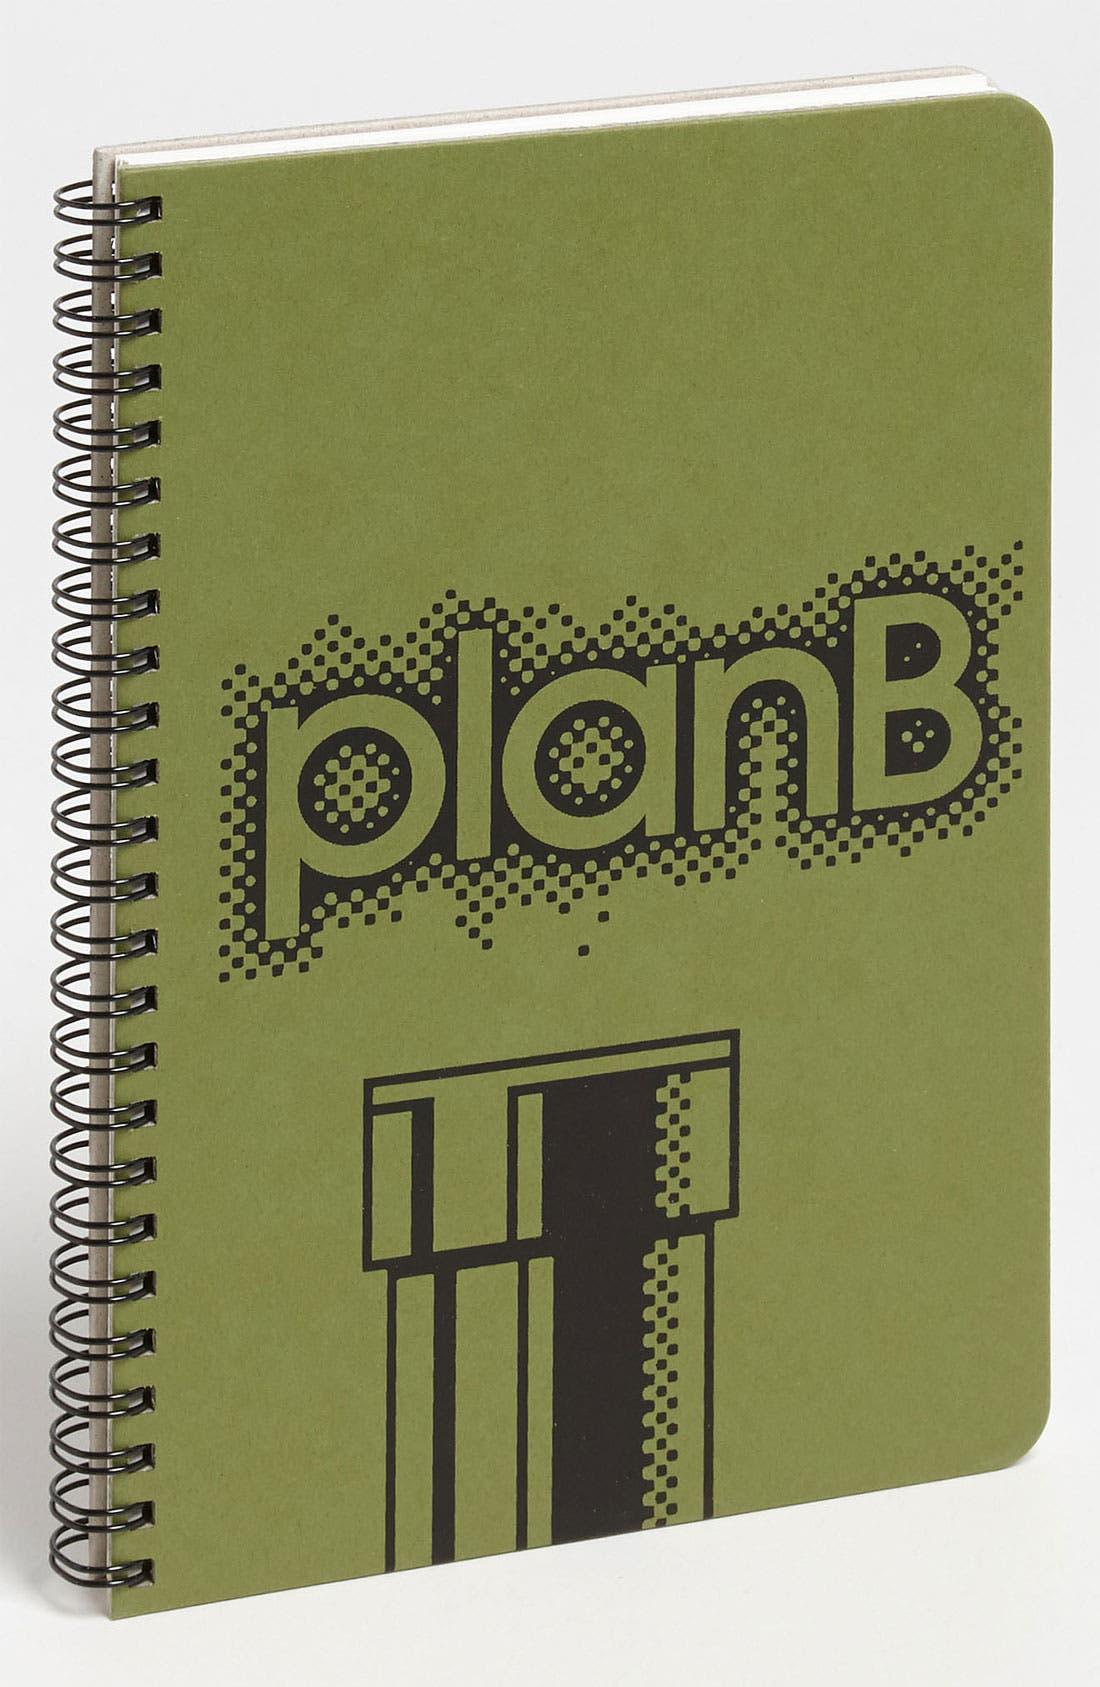 Alternate Image 1 Selected - Spiral Bound Notebook